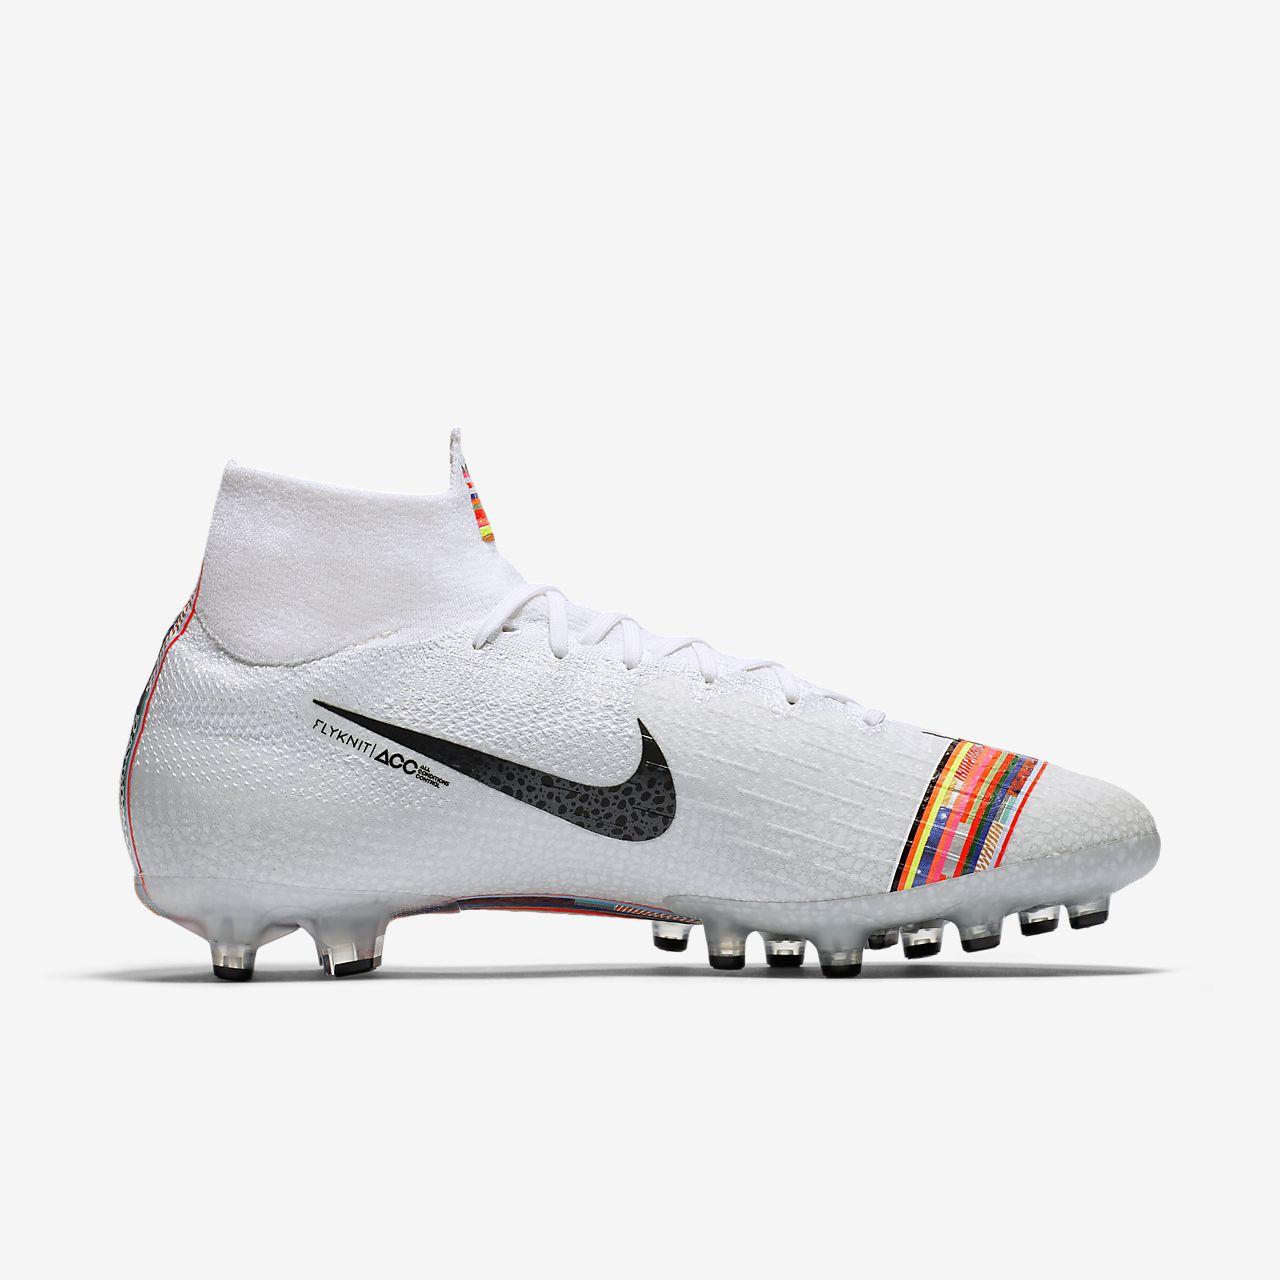 À 6 Crampons Synthétique Superfly Football Chaussure De Pour Elite Ag Pro Terrain Nike vNw0Oy8nm